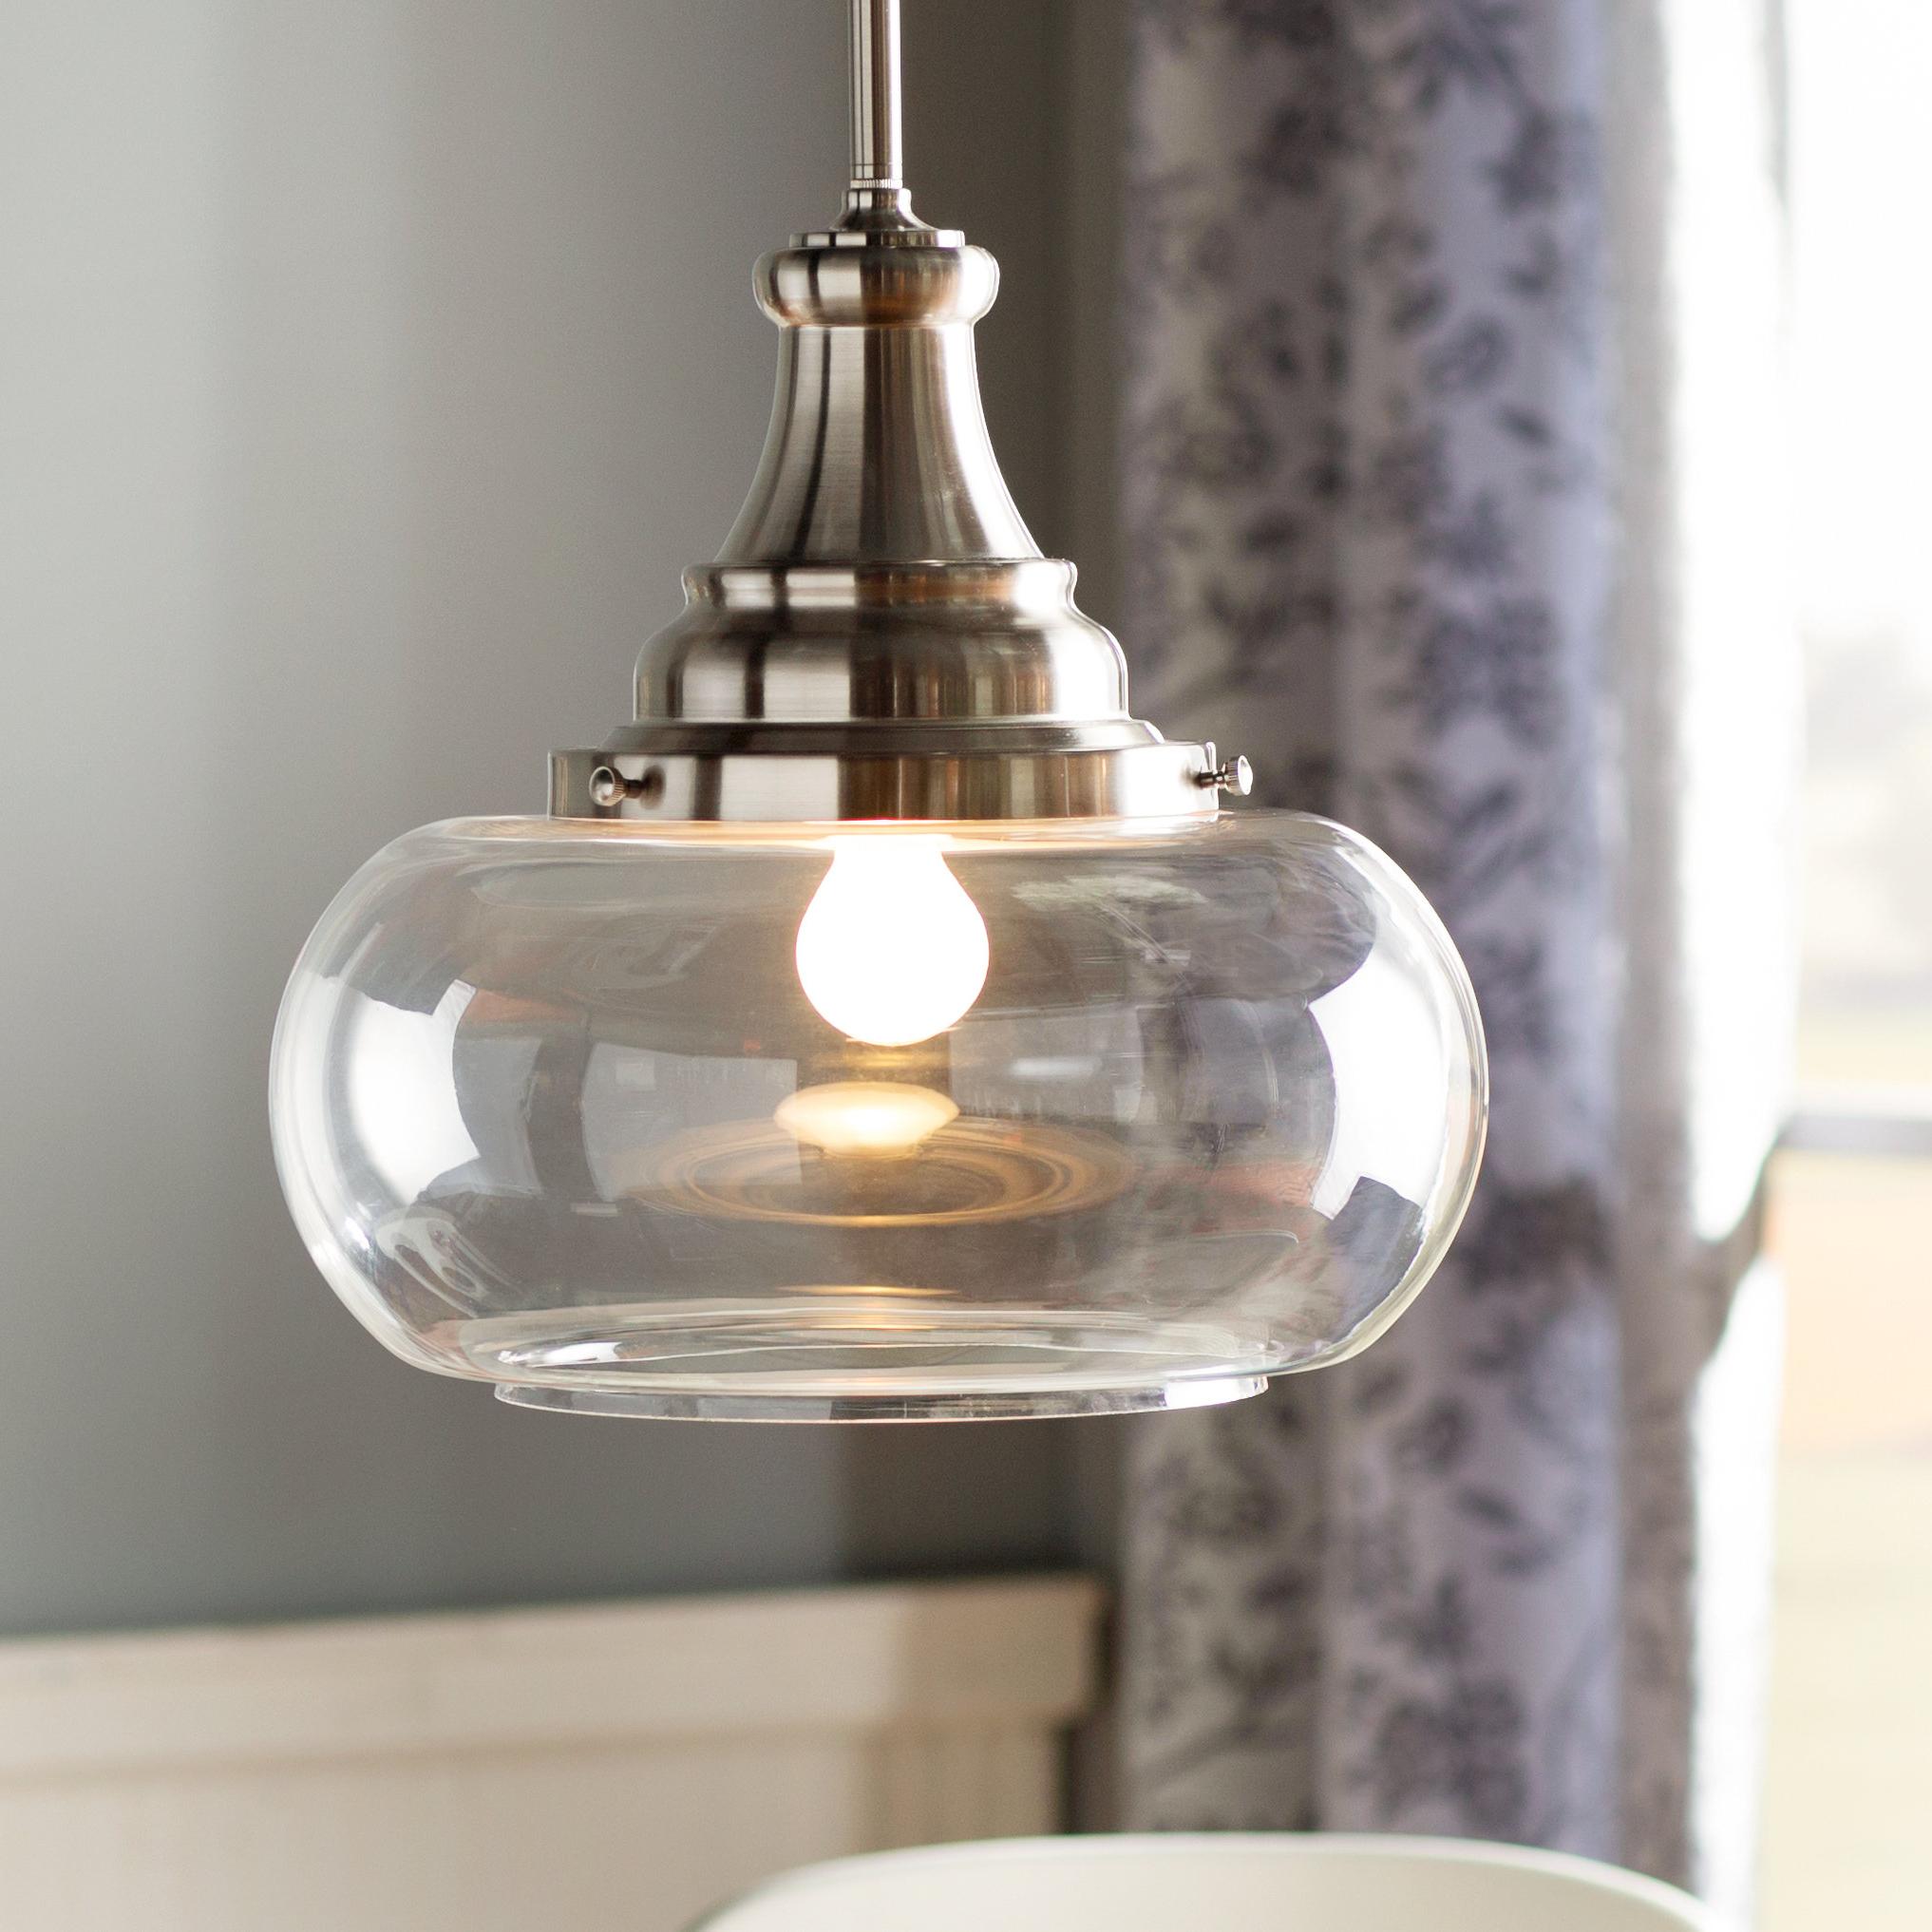 Carey 1 Light Single Bell Pendants Throughout 2020 1 Light Single Dome Pendant (Gallery 16 of 20)